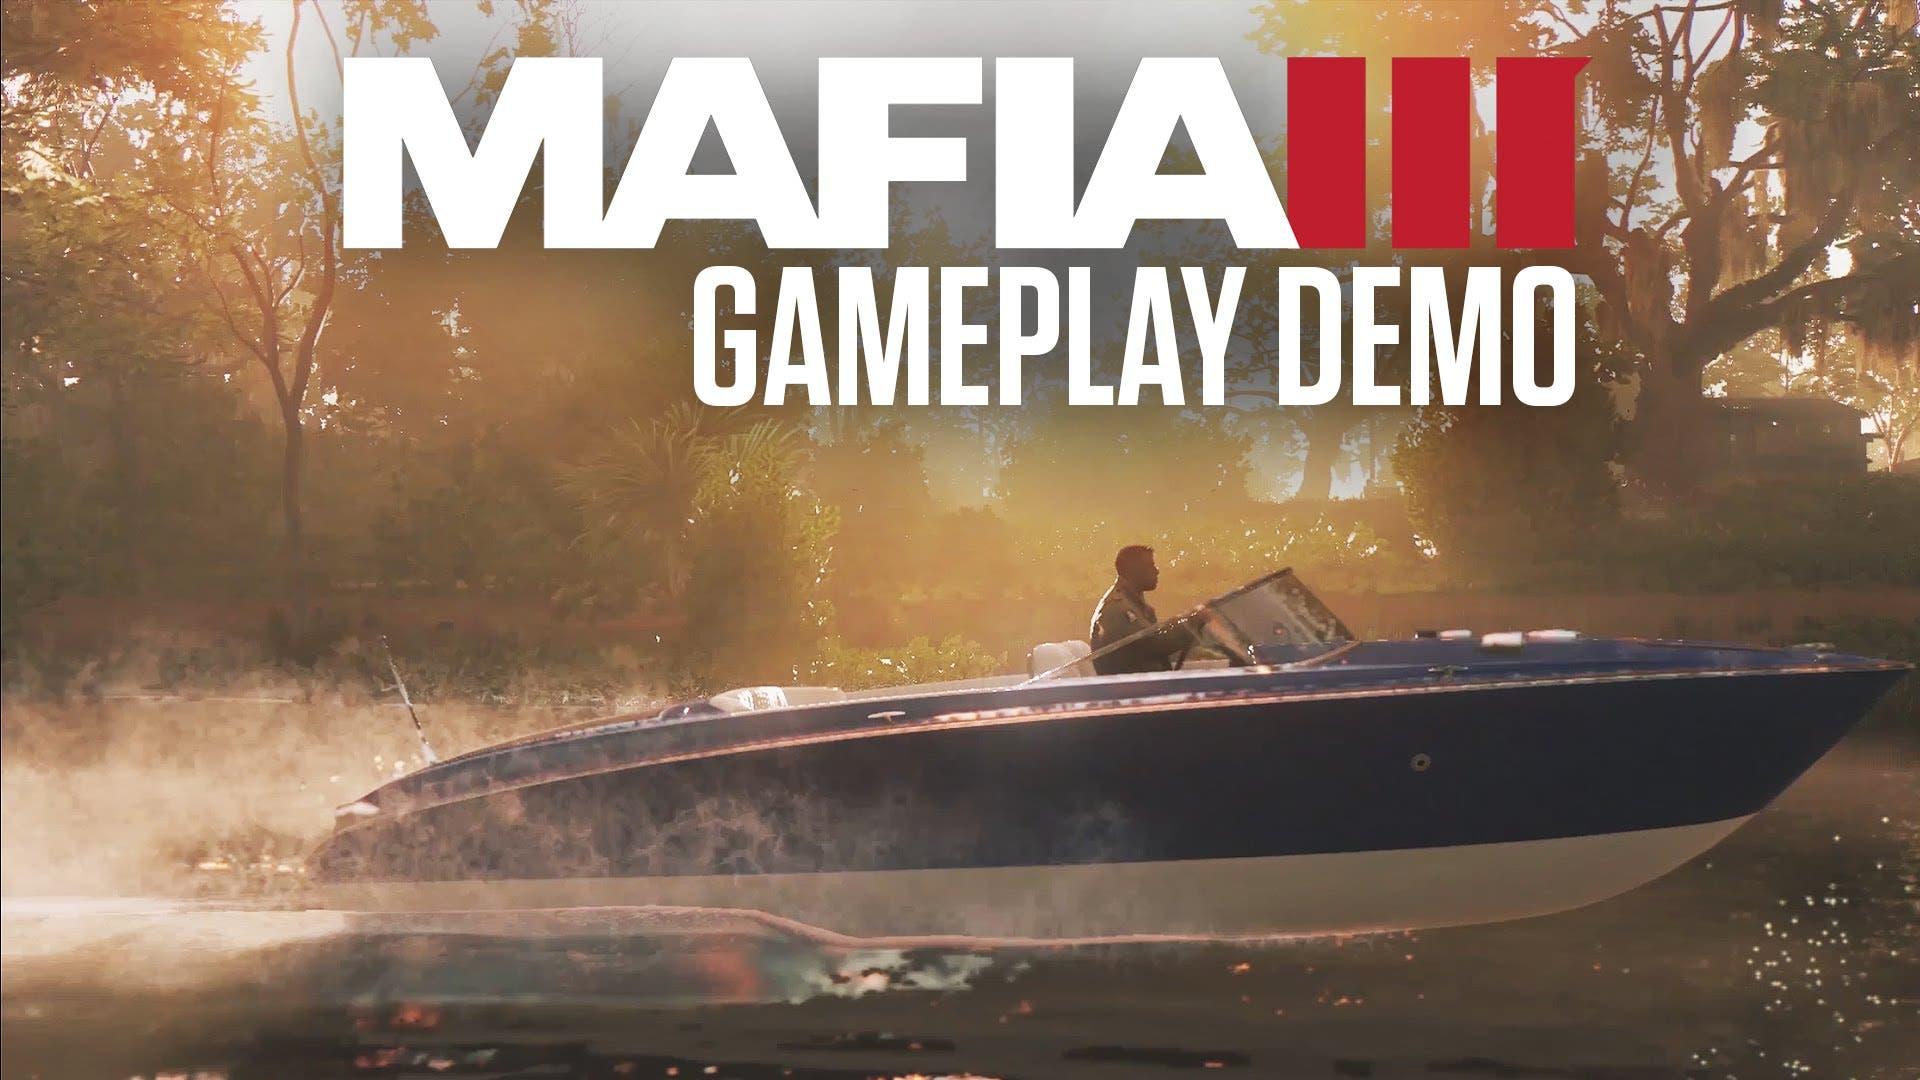 mafia iii gameplay demo shows of